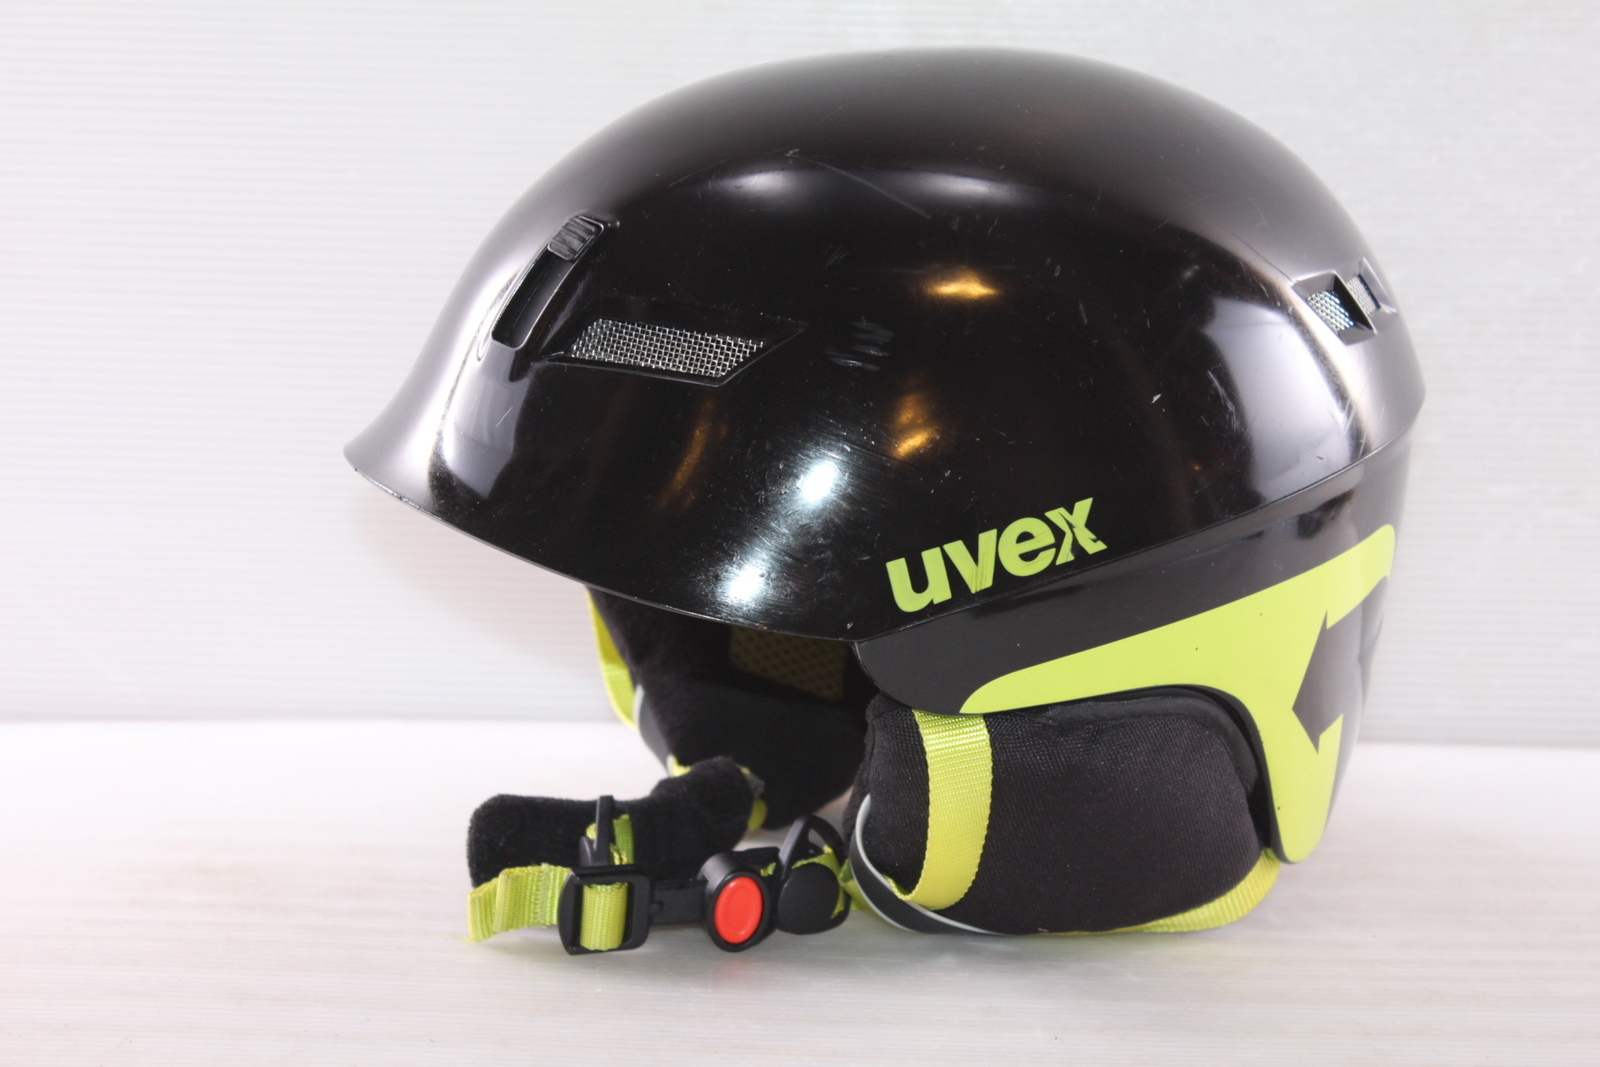 Dětská lyžařská helma Uvex Uvex - posuvná vel. 55 - 59